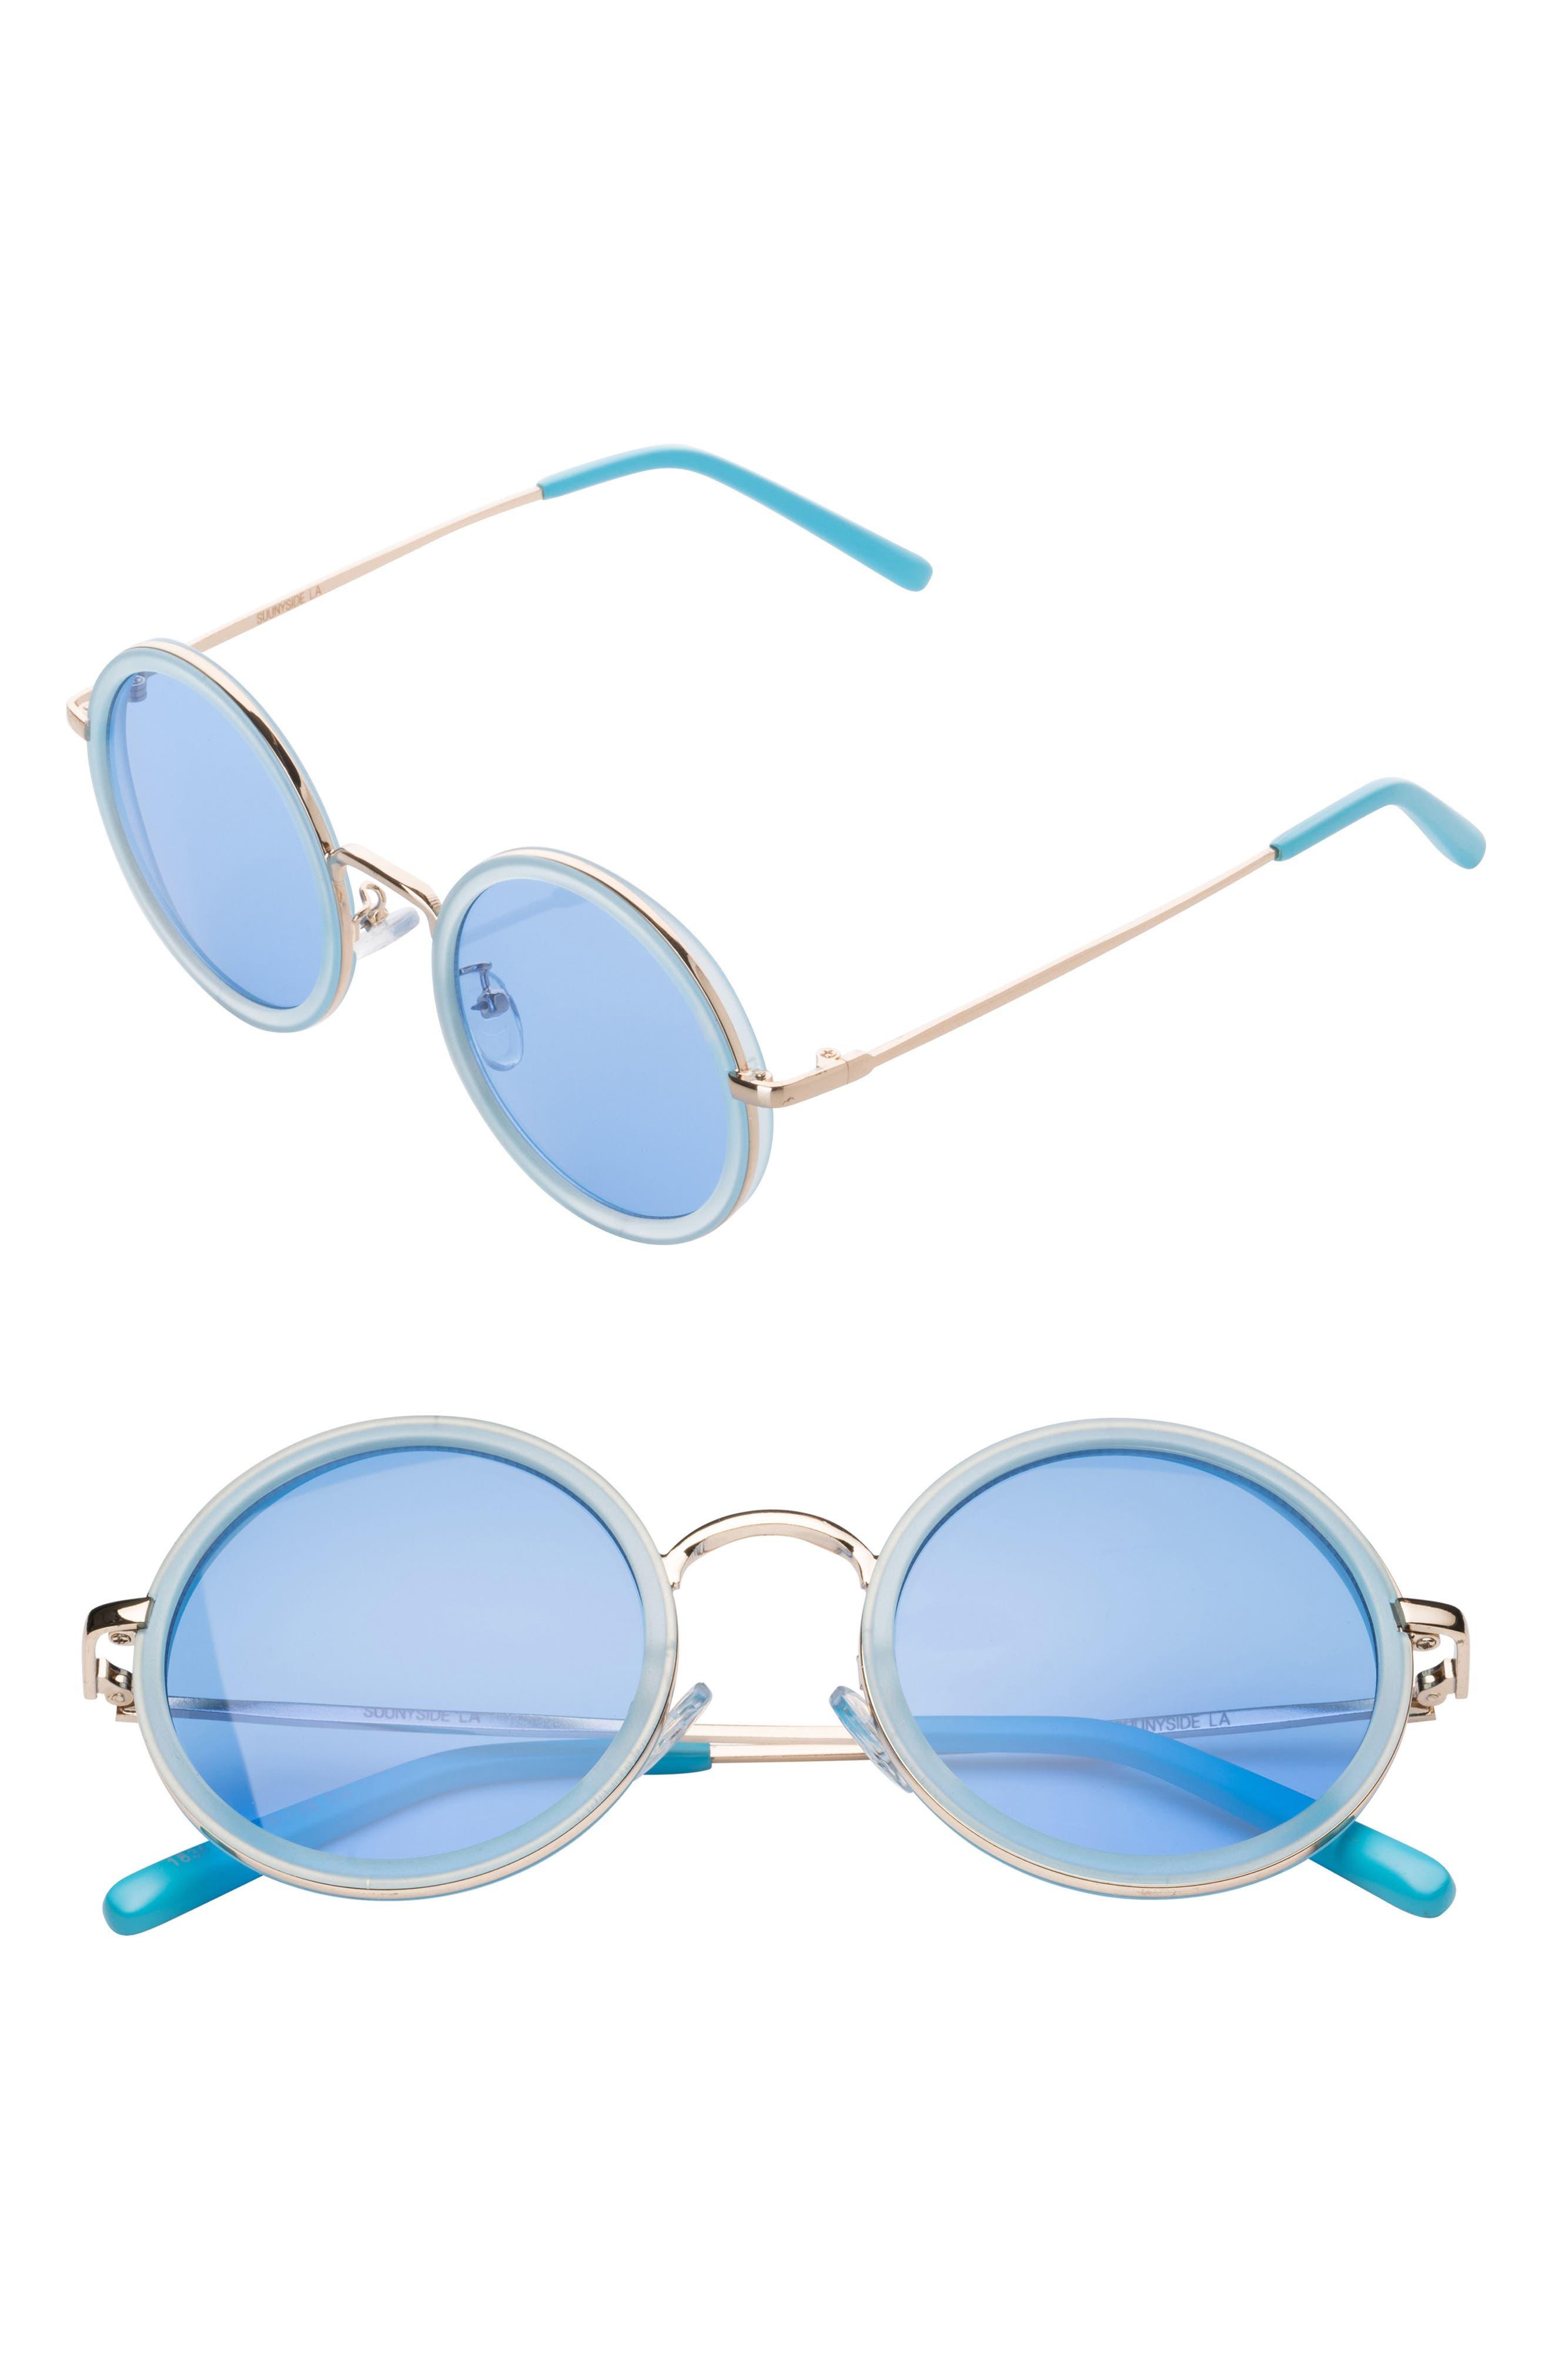 48mm Round Sunglasses,                         Main,                         color, Blue/ Silver